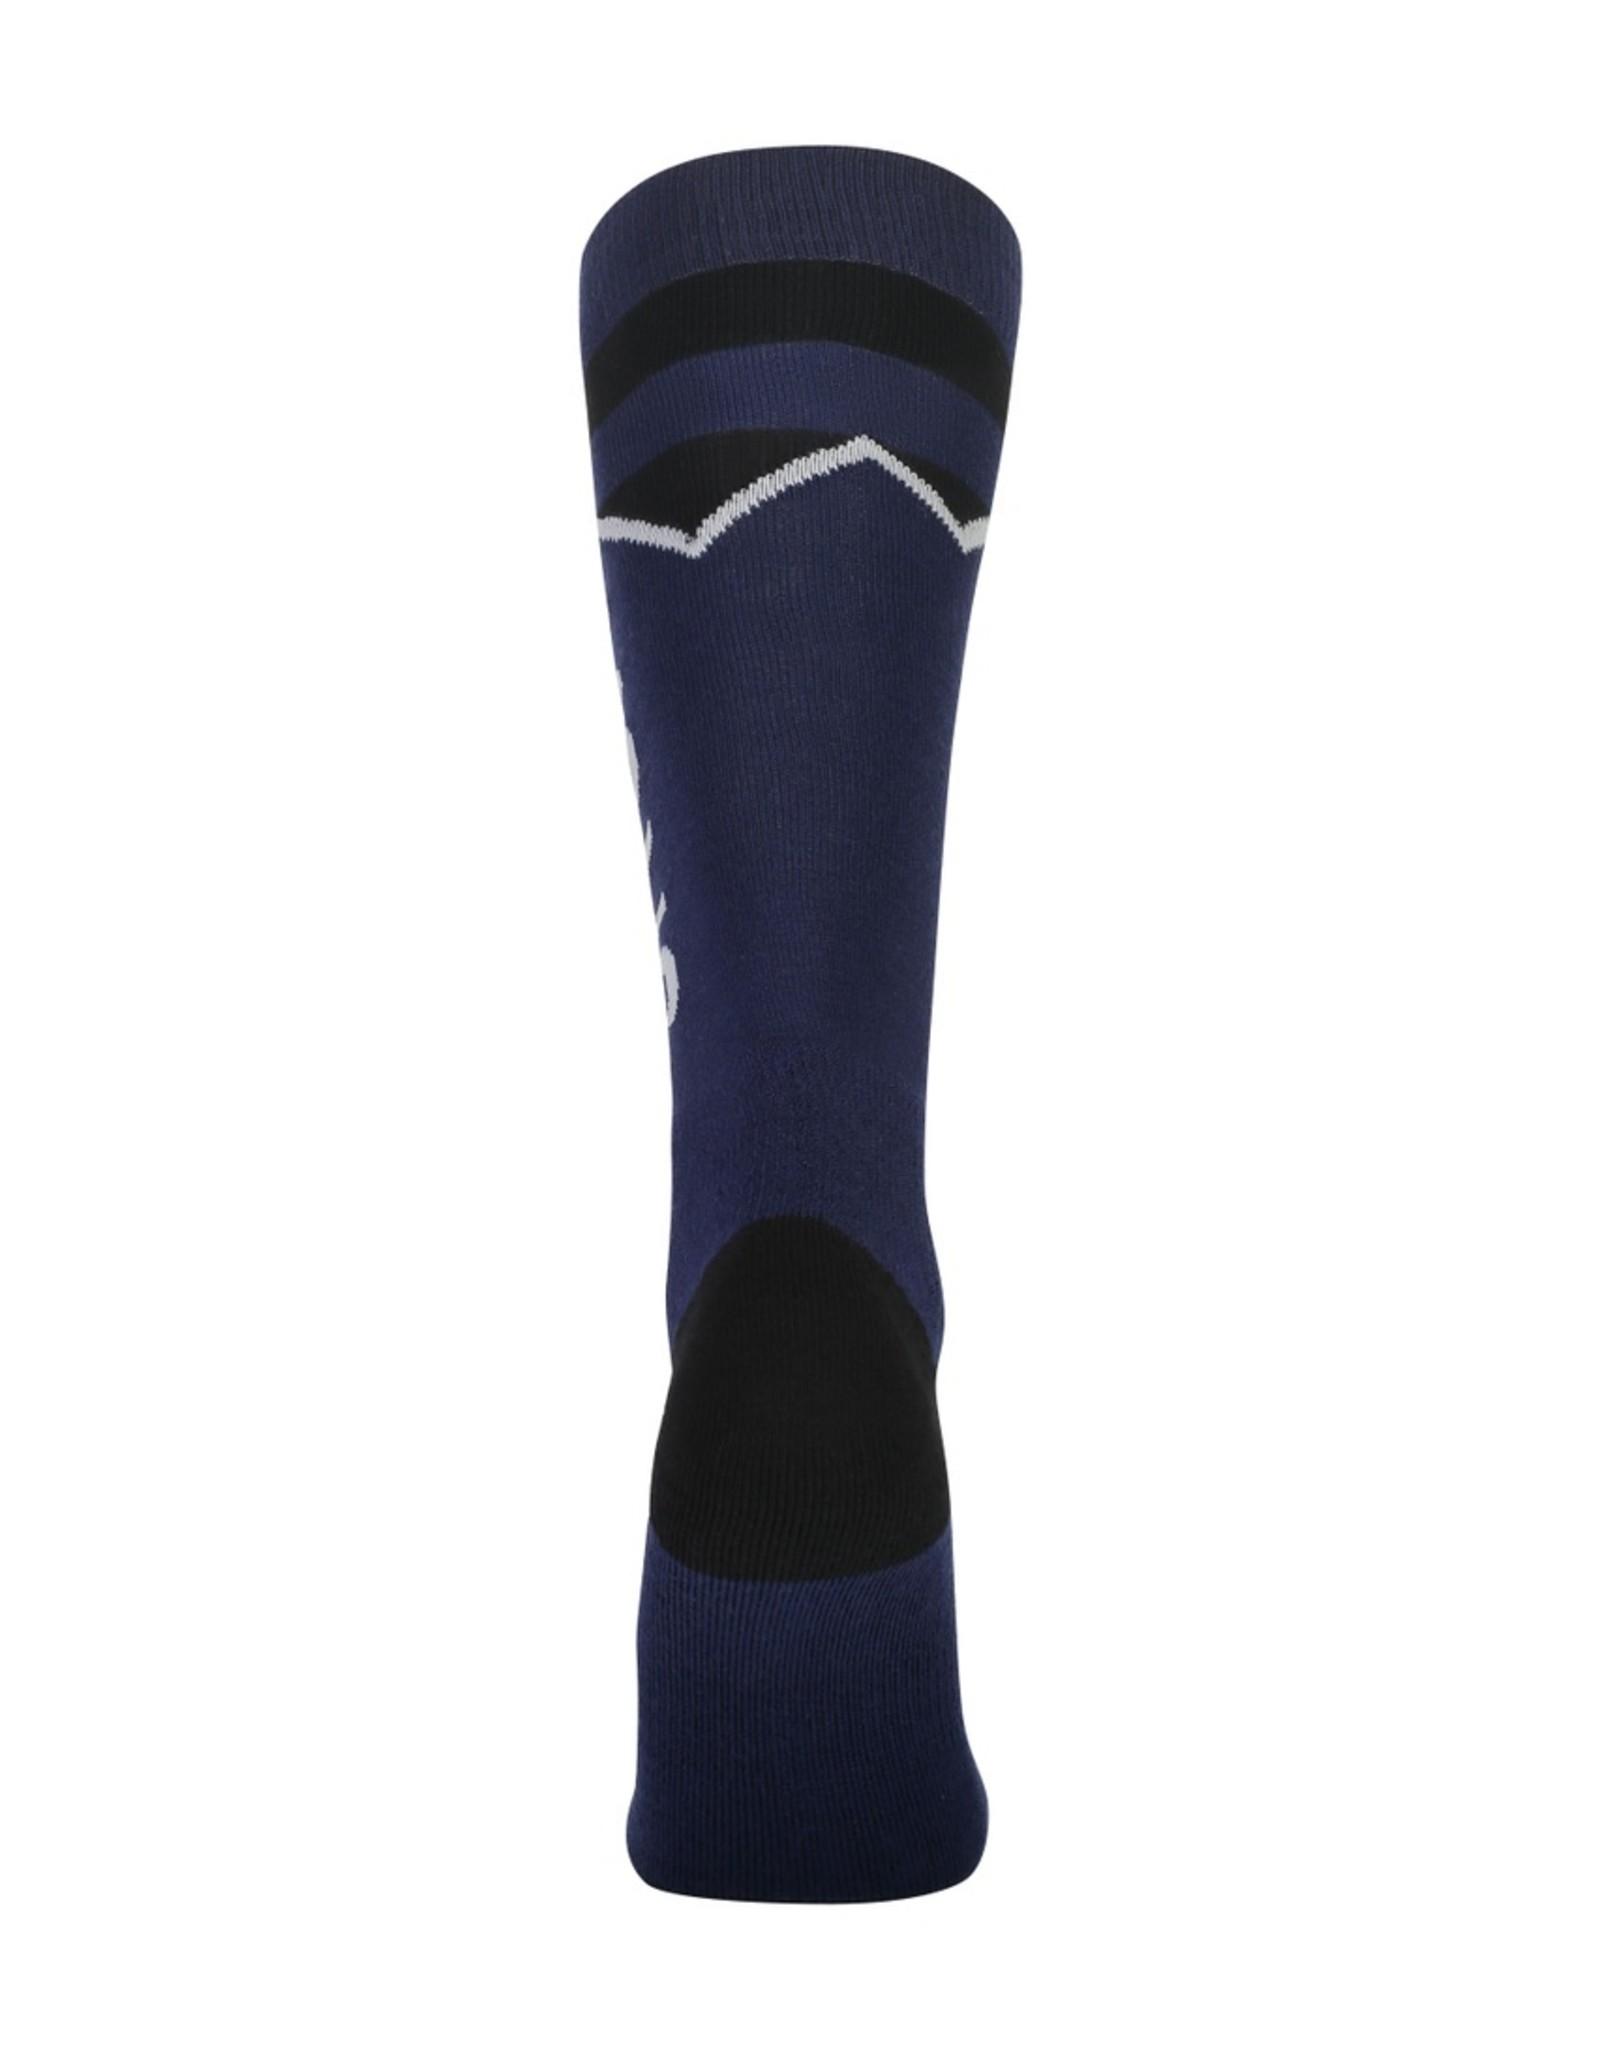 Mons Royale Mons Royale Mens Lift Access Sock -W2022